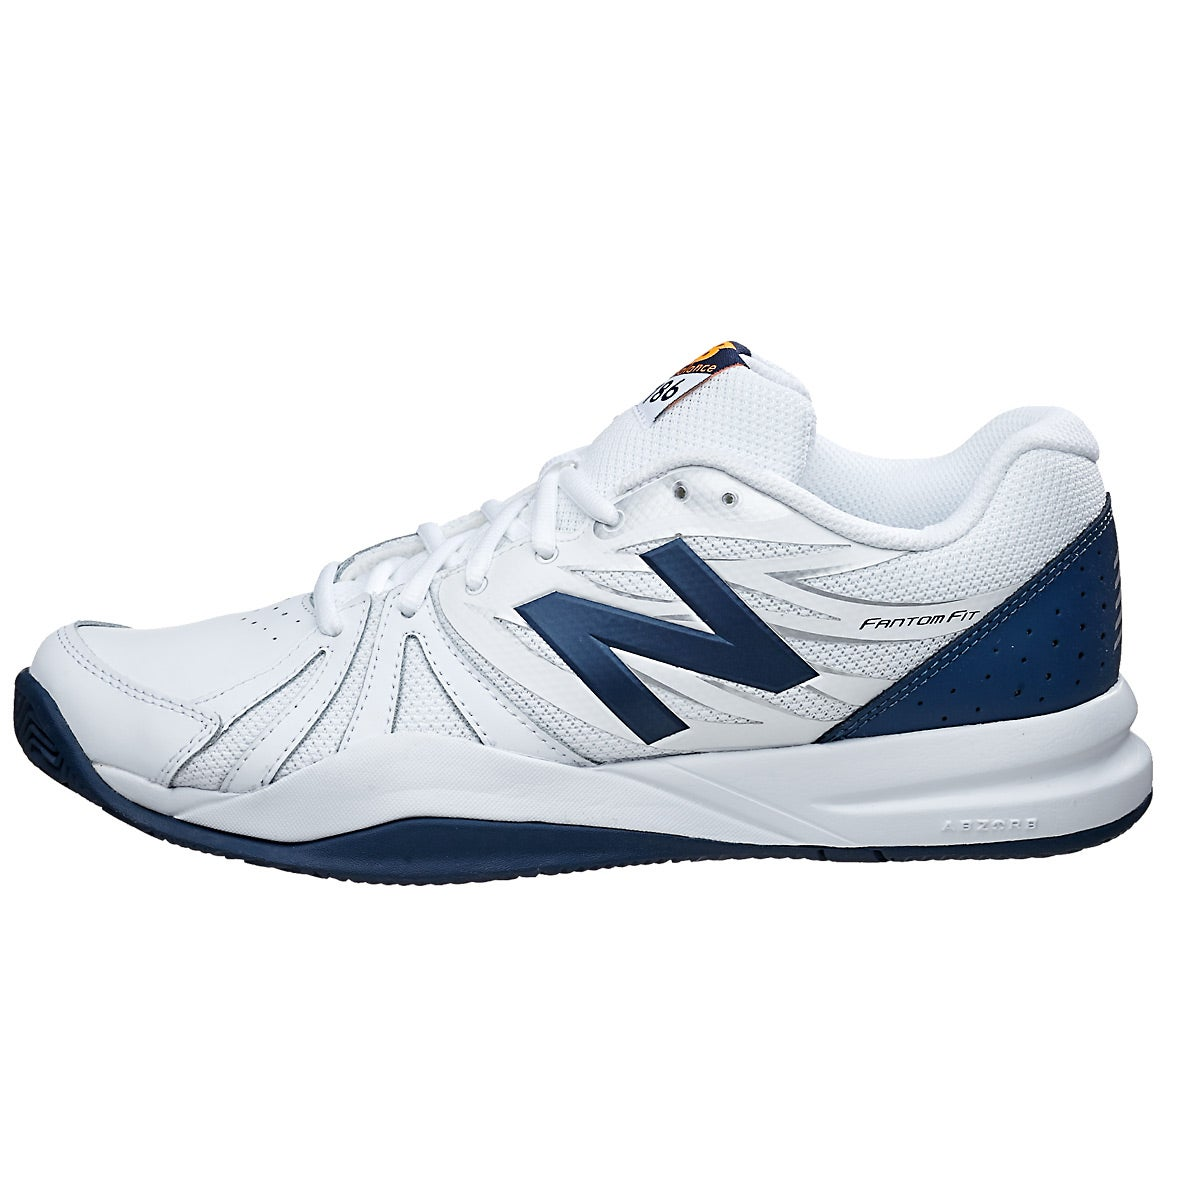 Blue Shoes Sie